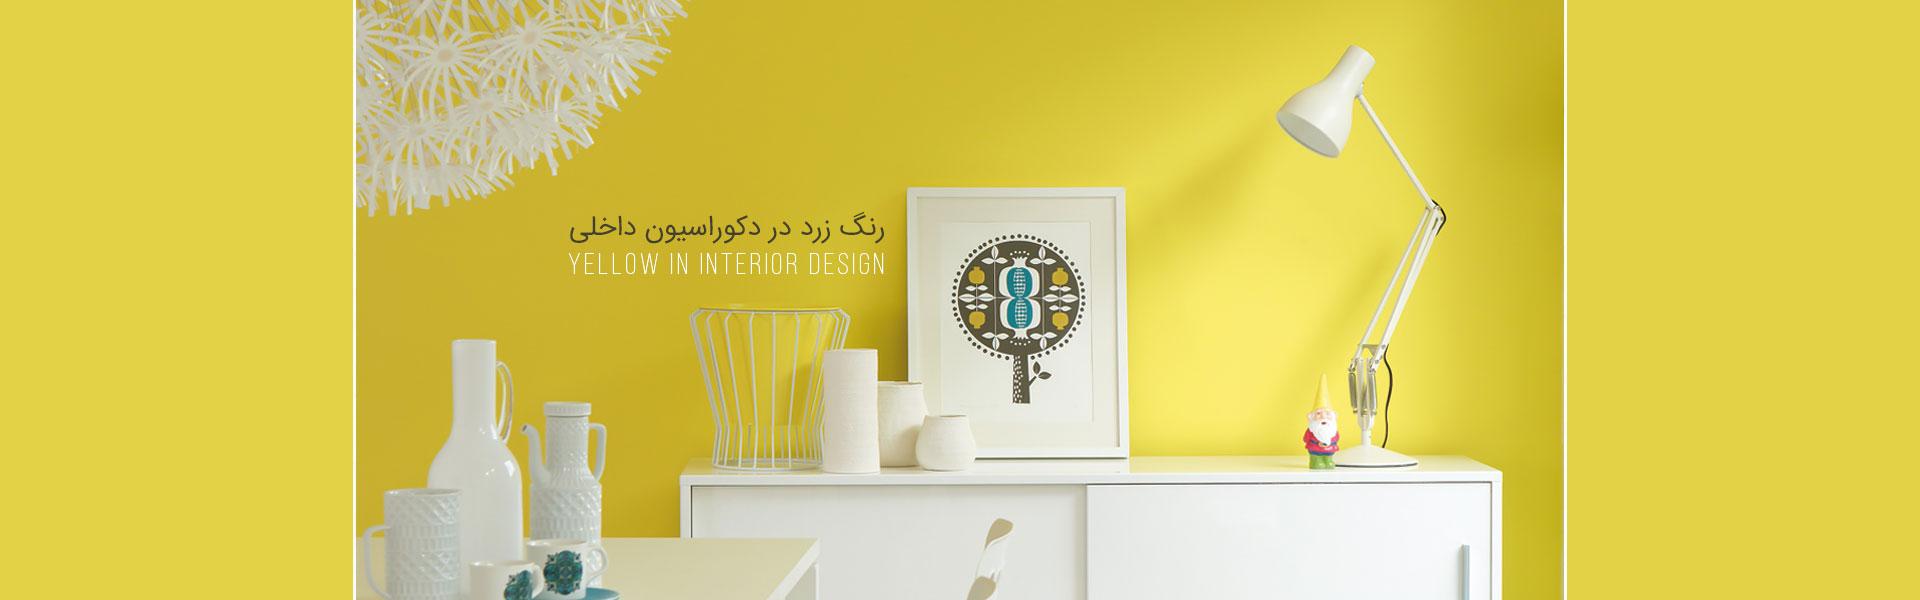 decorasion rang zard1 - رنگ زرد در دکوراسیون داخلی